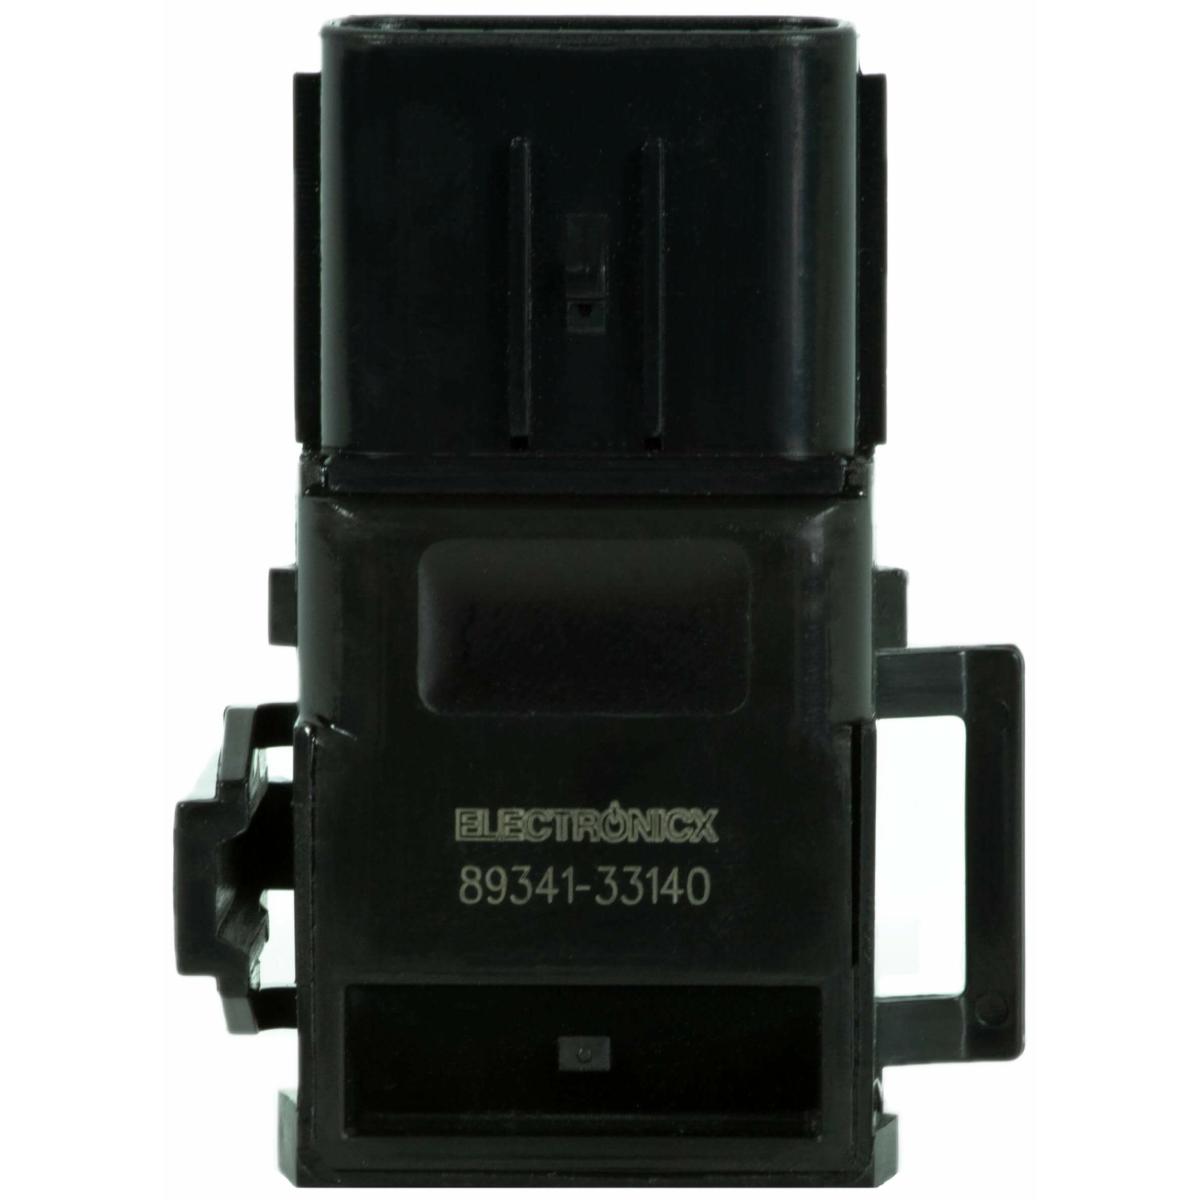 Parksensor 89341-33140 für Toyota PDC Parktronic